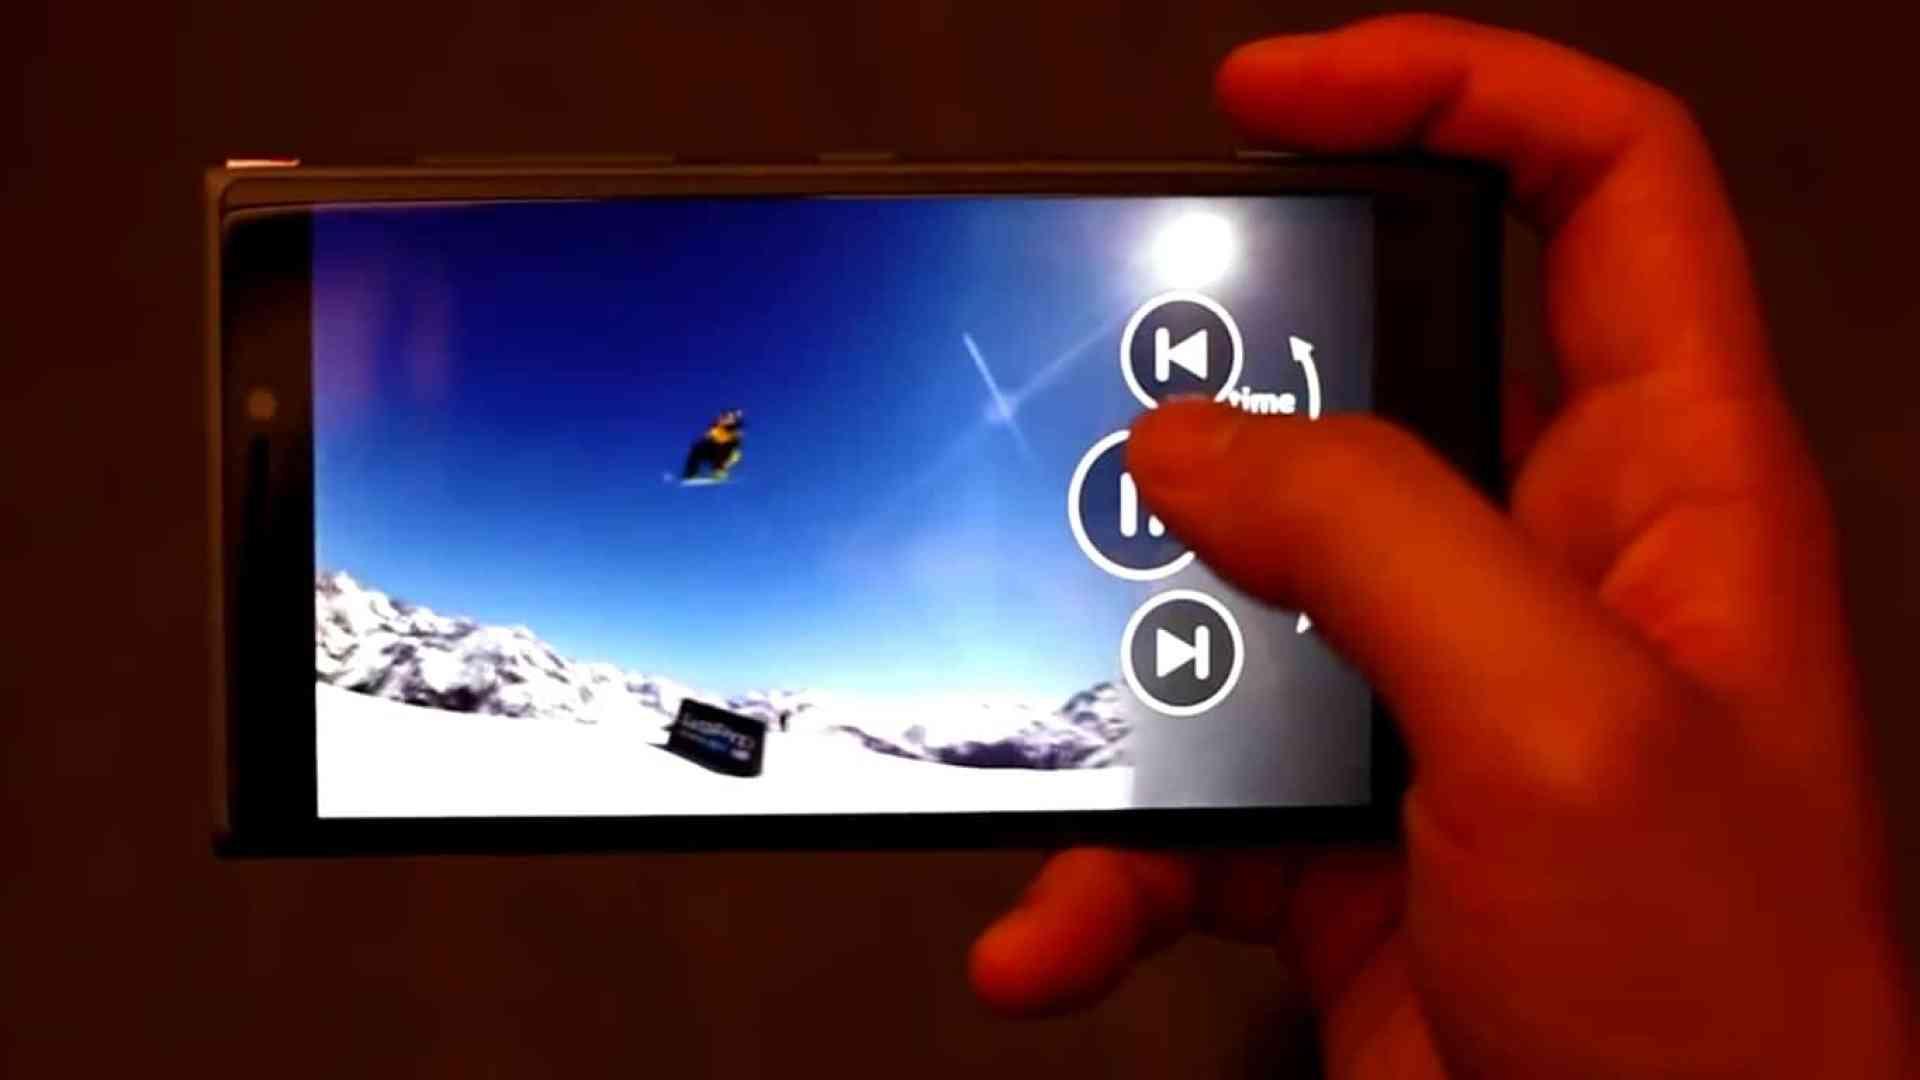 Microsoft 3D Touch / Pre-Touch Sensing